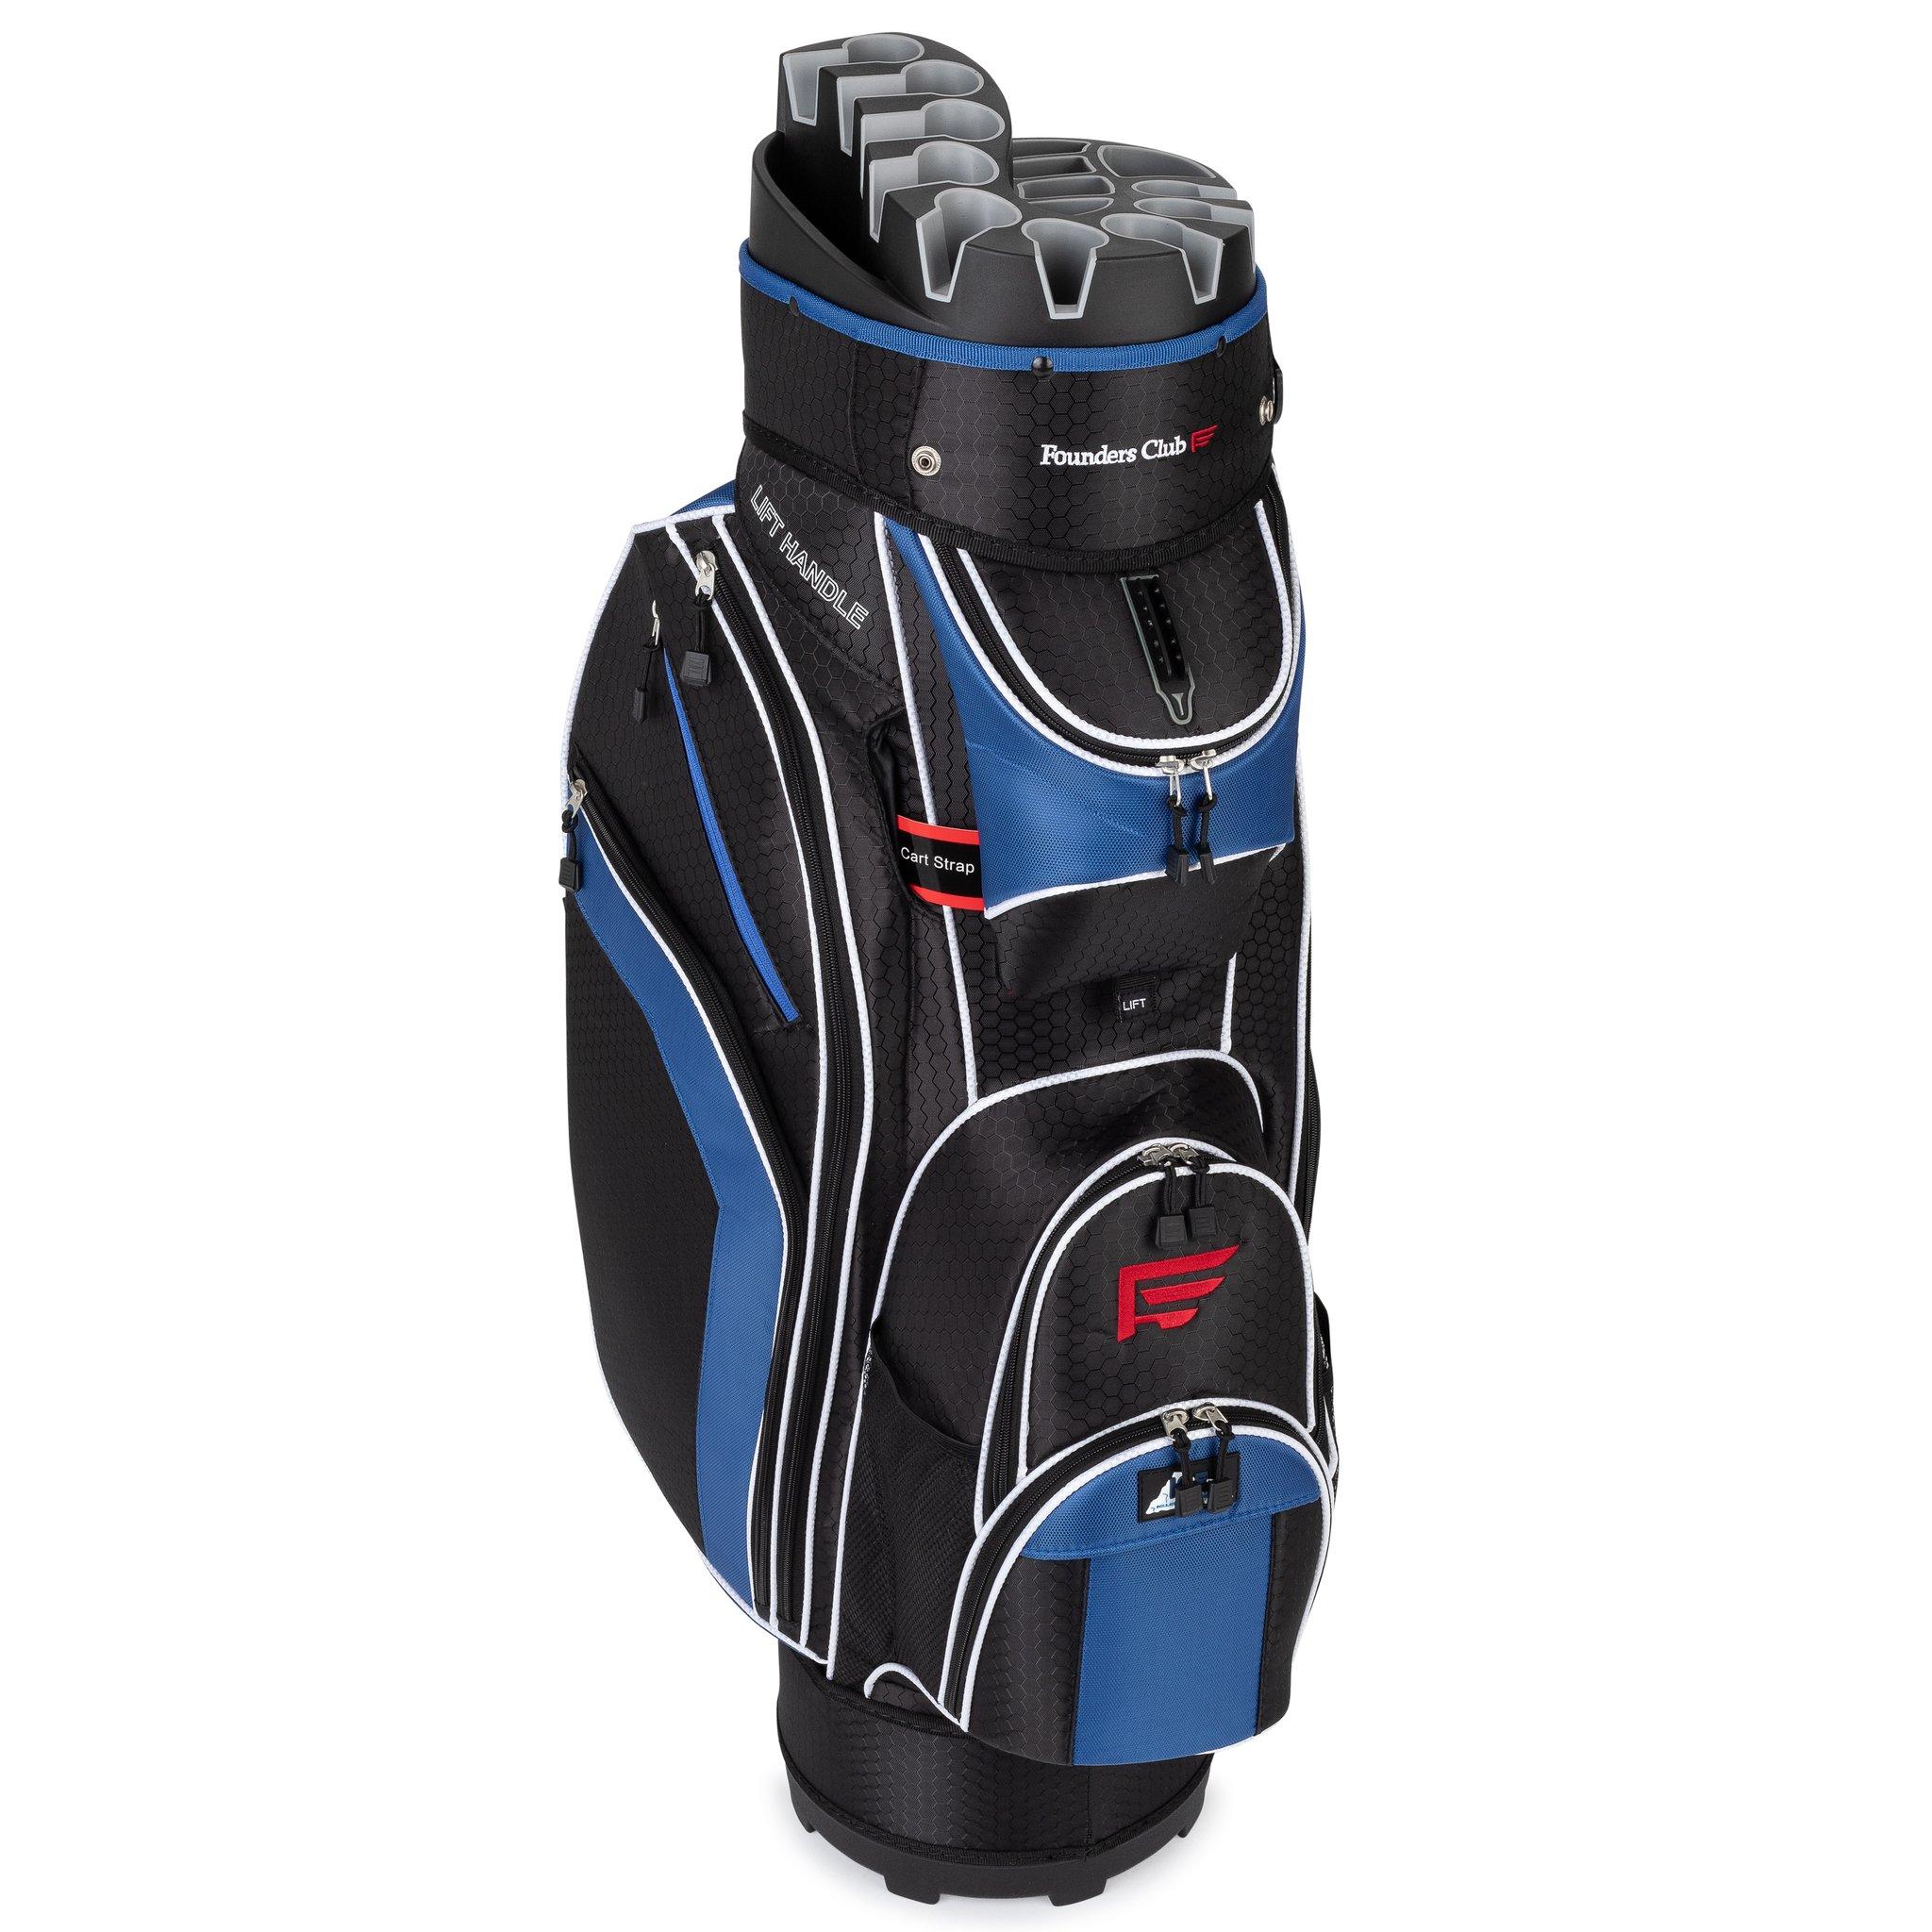 Founders Club Golf Cart Bag